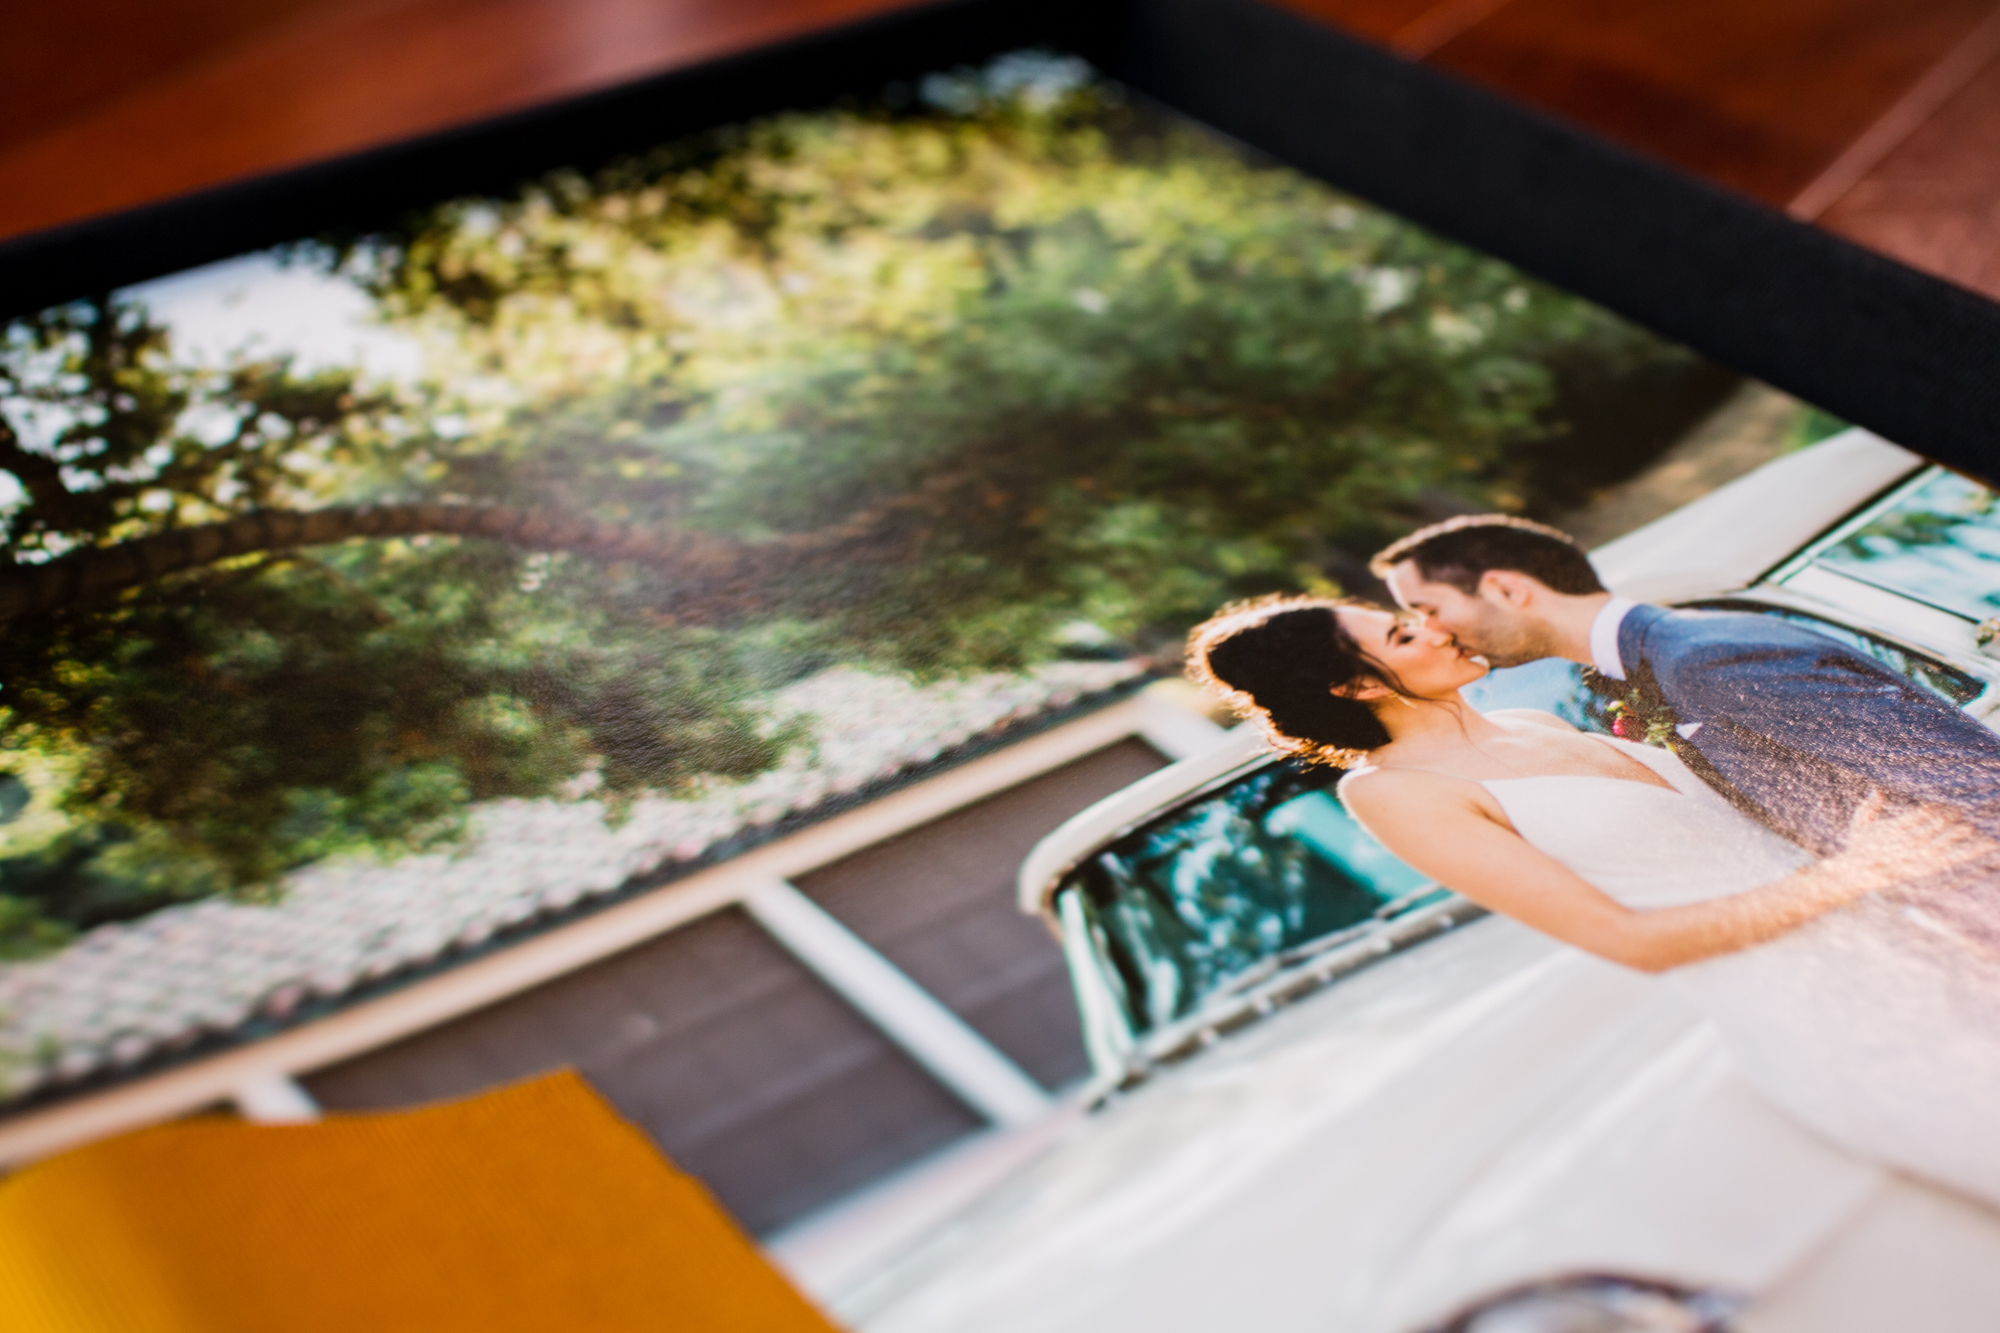 005-los-angeles-wedding-photography-todd-danforth.jpg